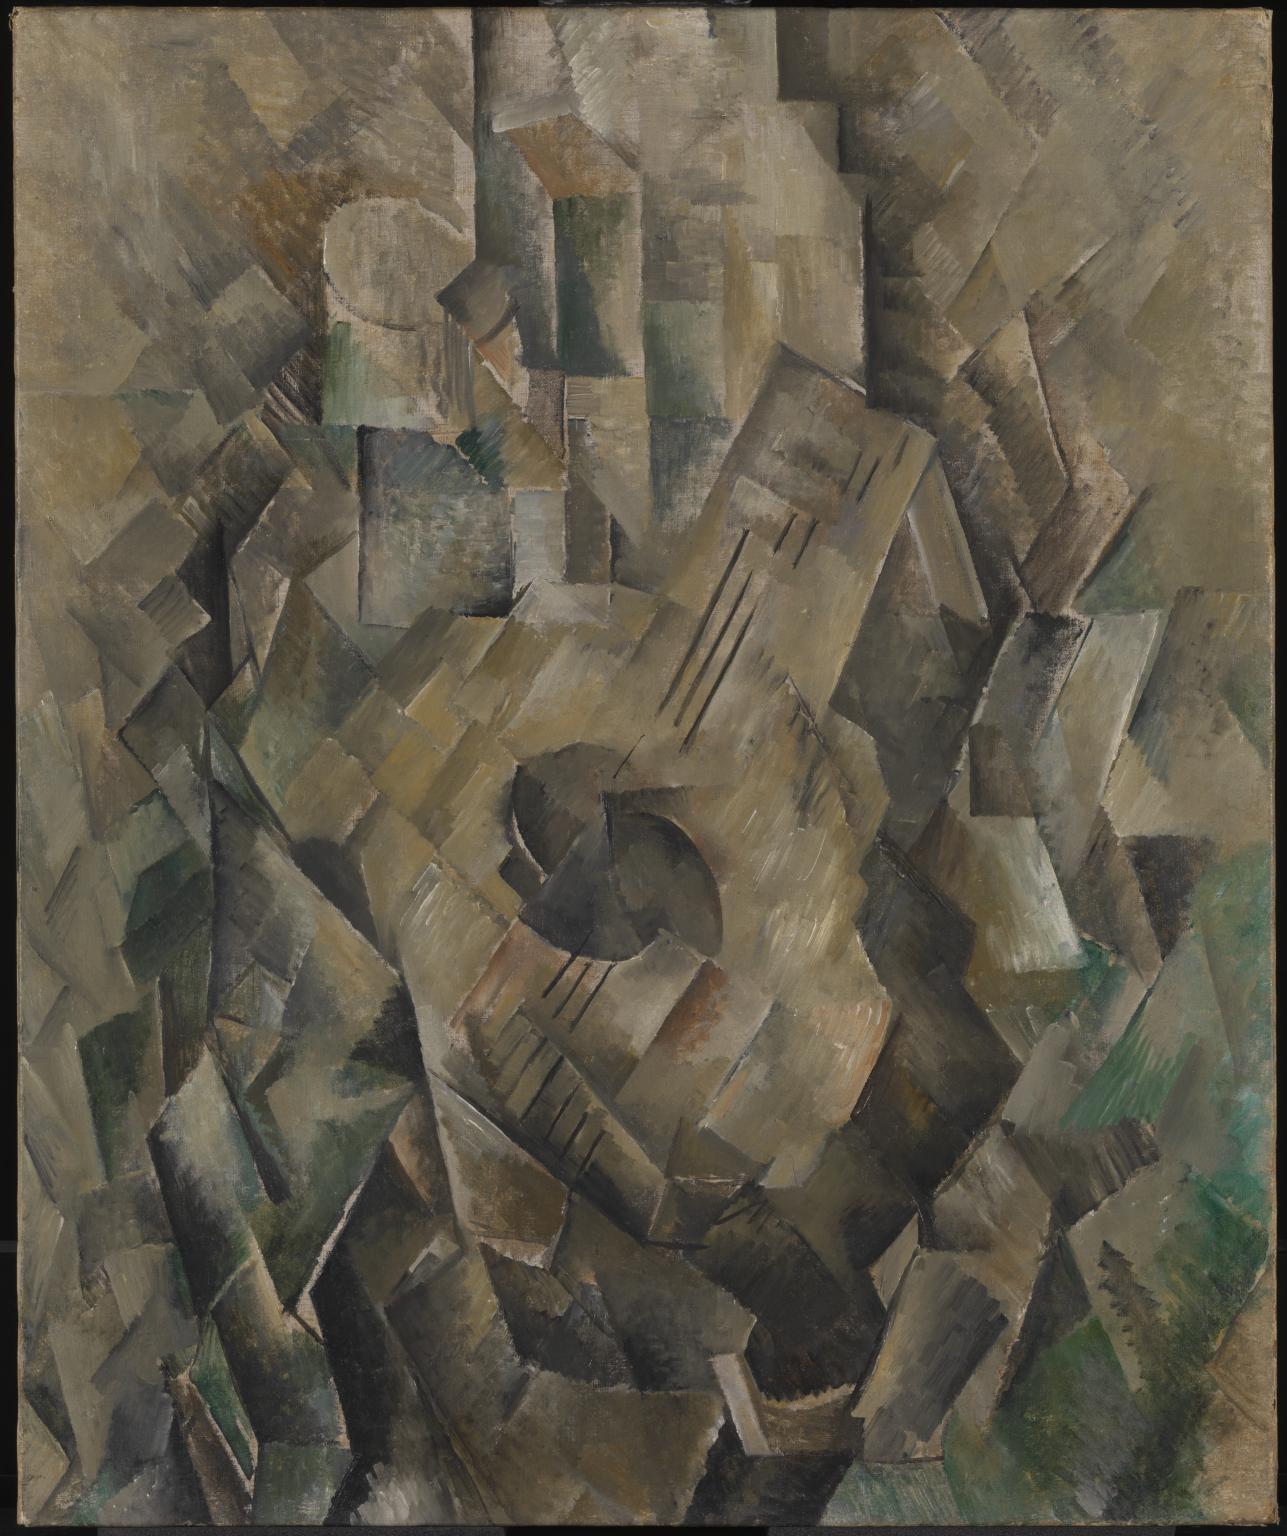 Georges Braque, La Mandore